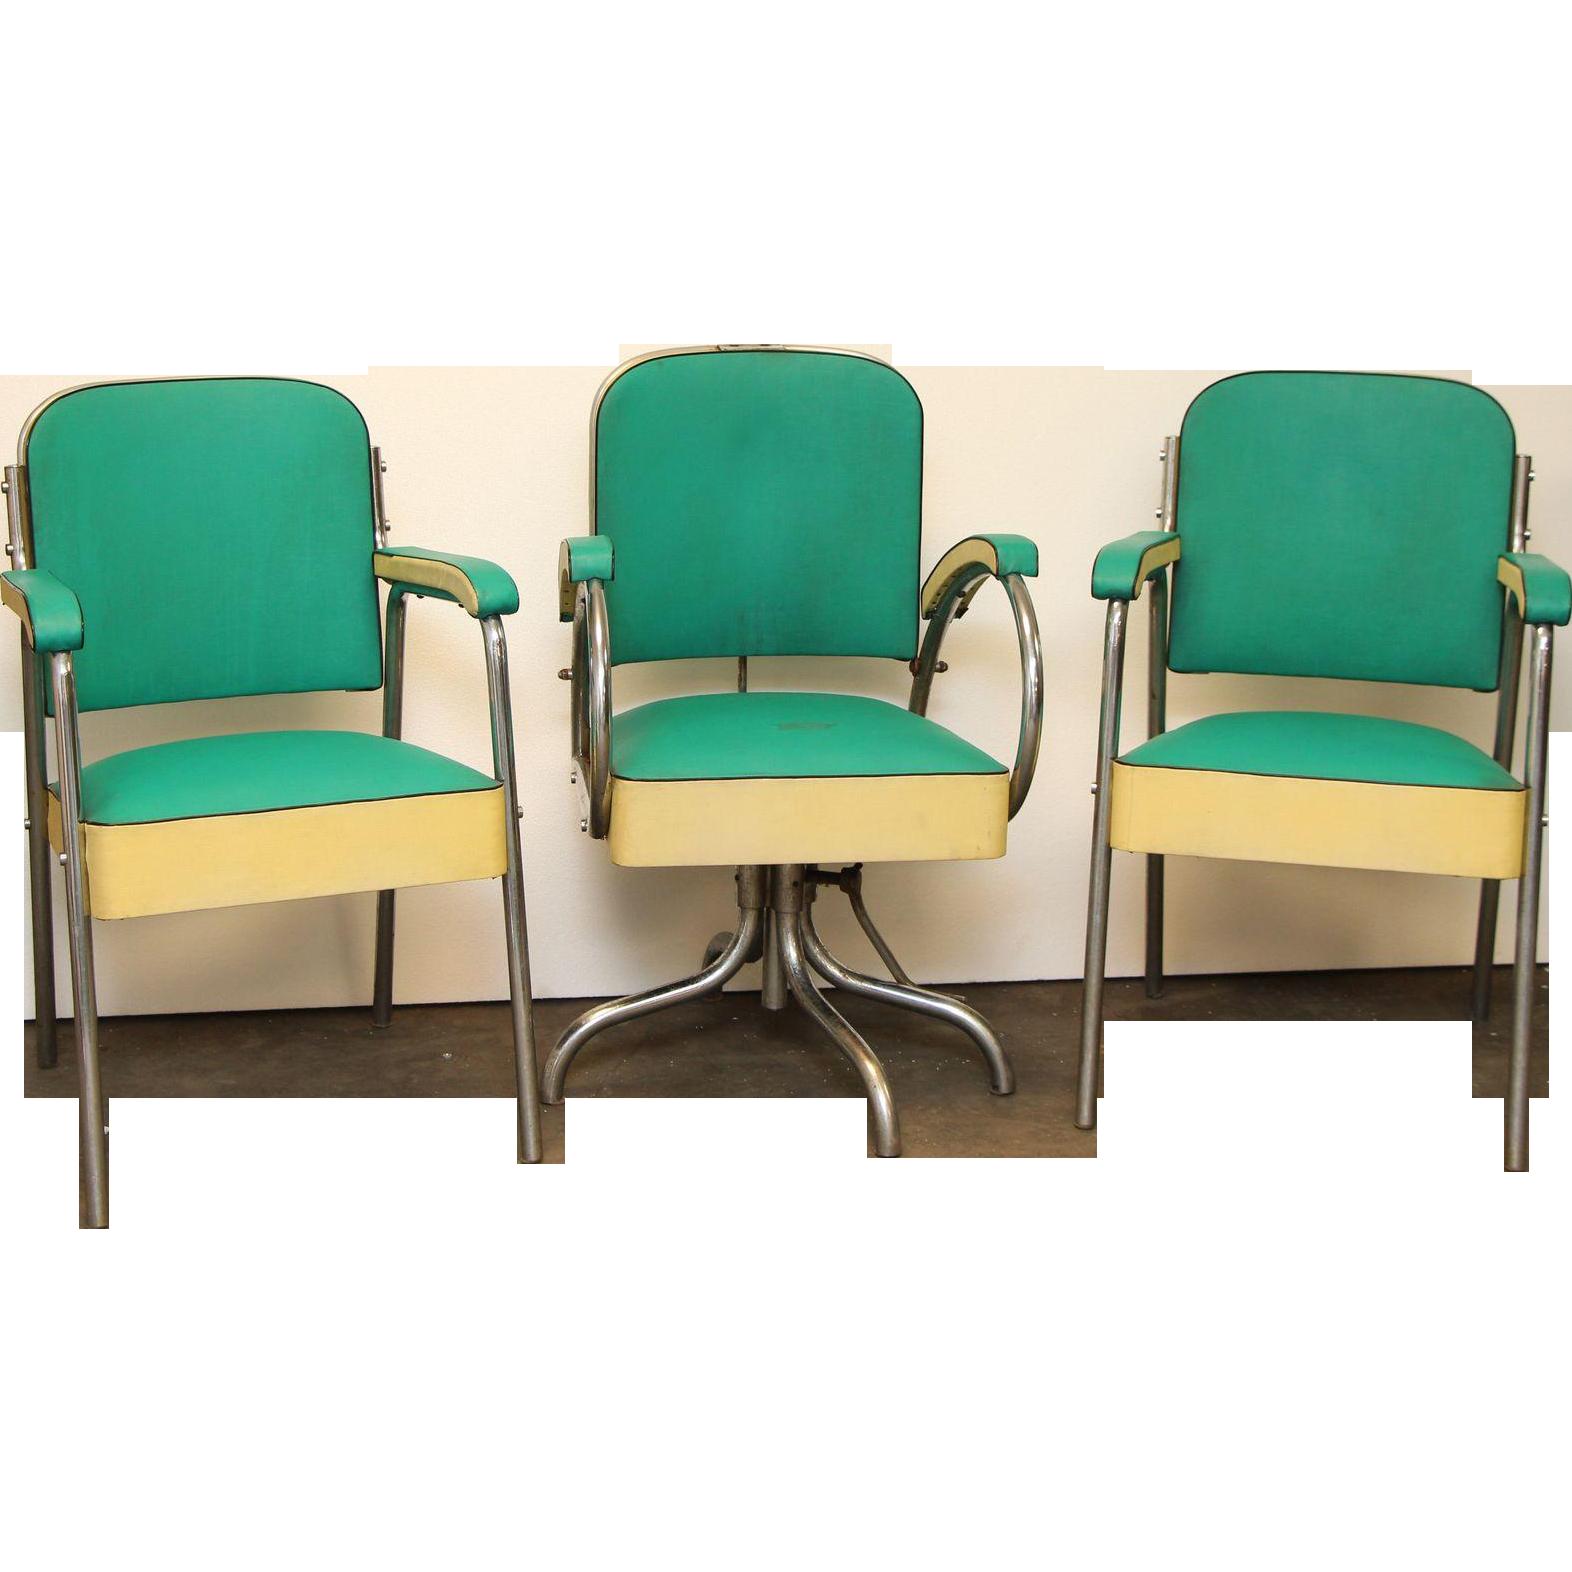 Vintage teal hair salon chair